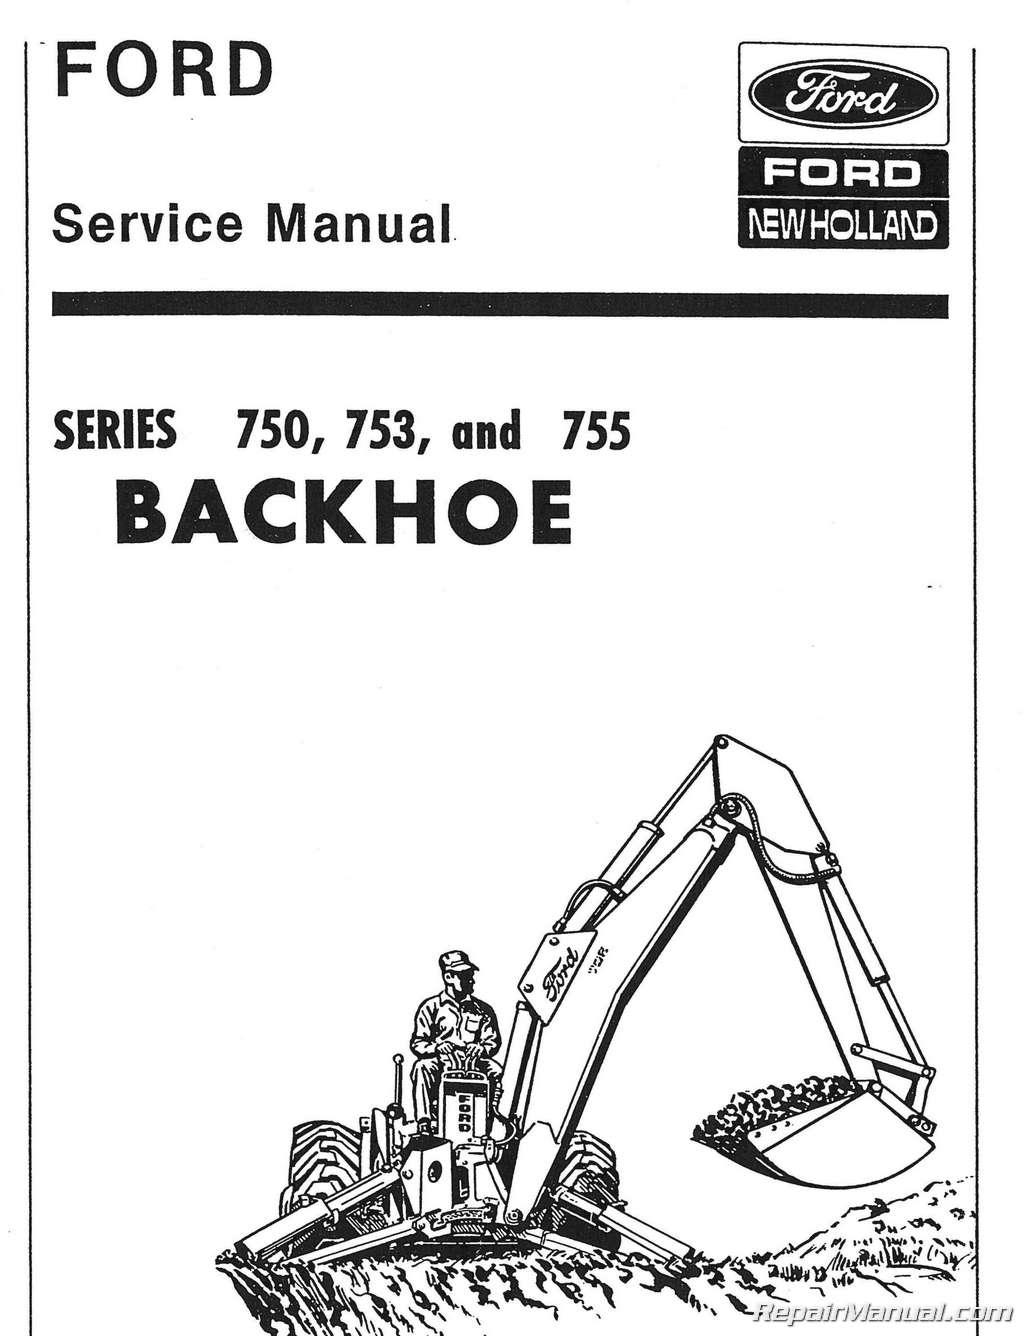 ford 750 753 755 backhoe service manual